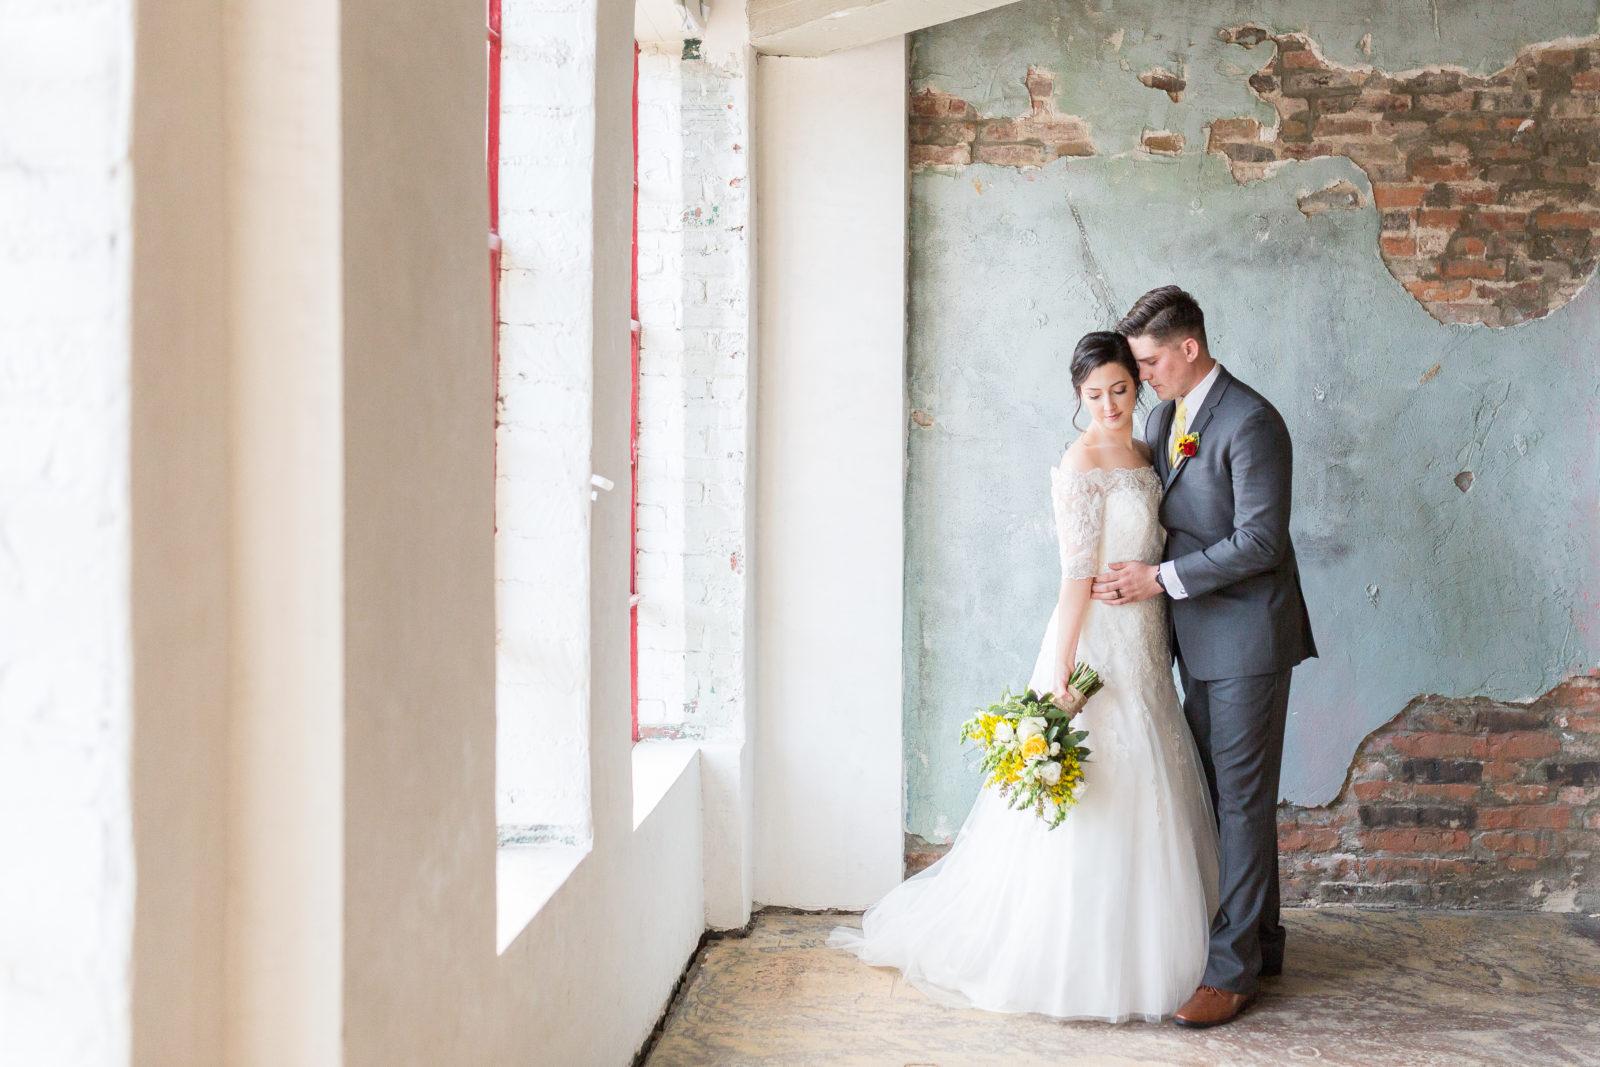 Destination-Nashville-Wedding-Photographer-1-1600x1067.jpg